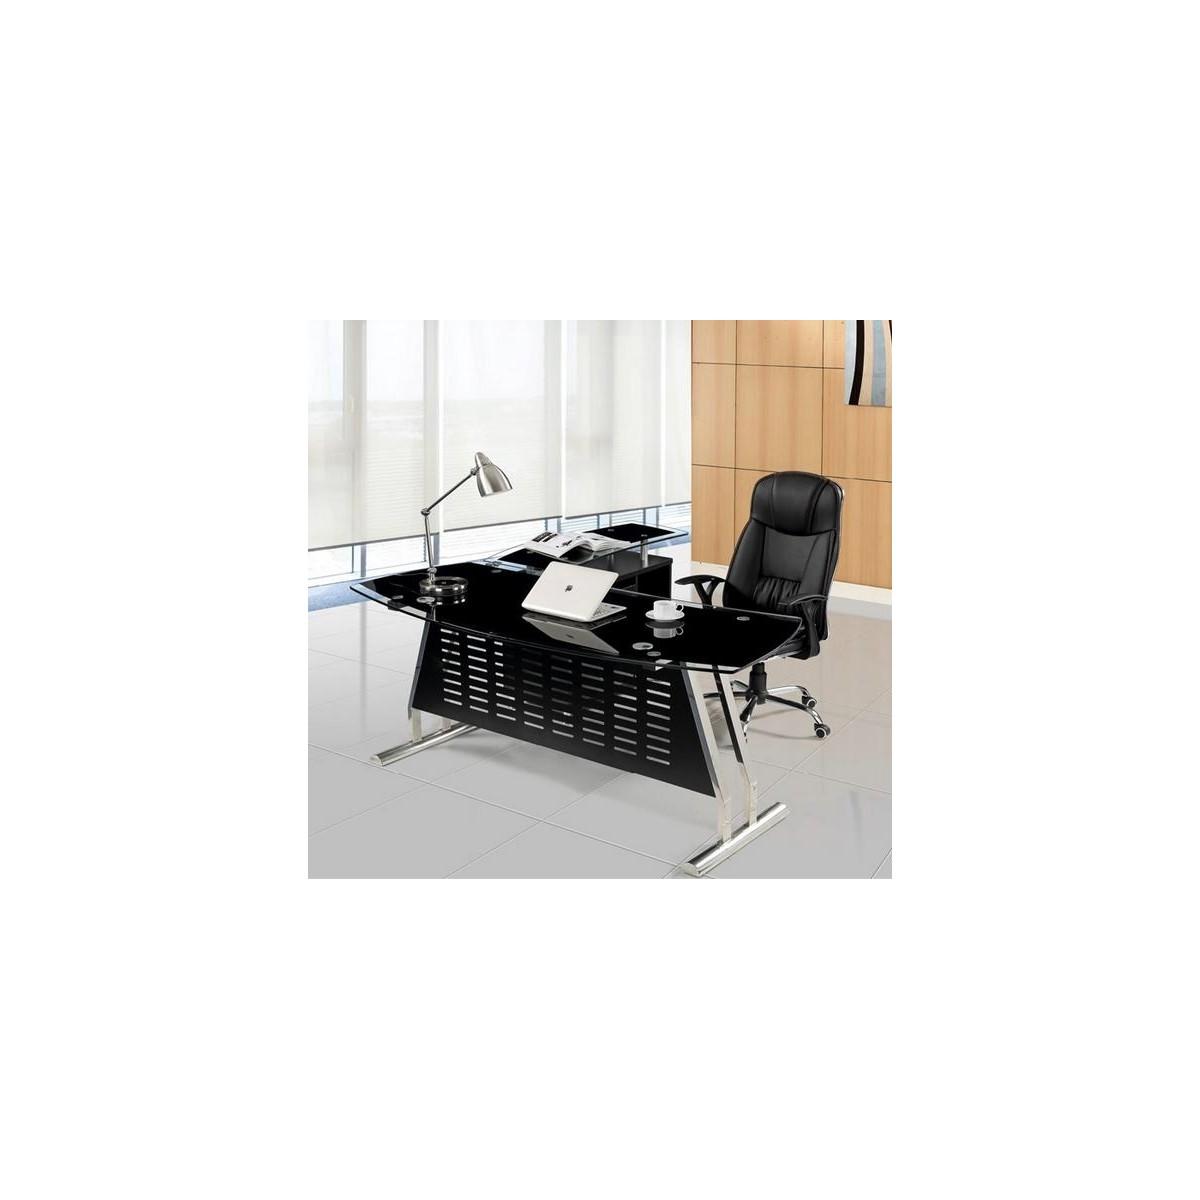 Mesa oficina cristal negro ala derecha 180x85 cms de sdm for Mesa cristal oficina